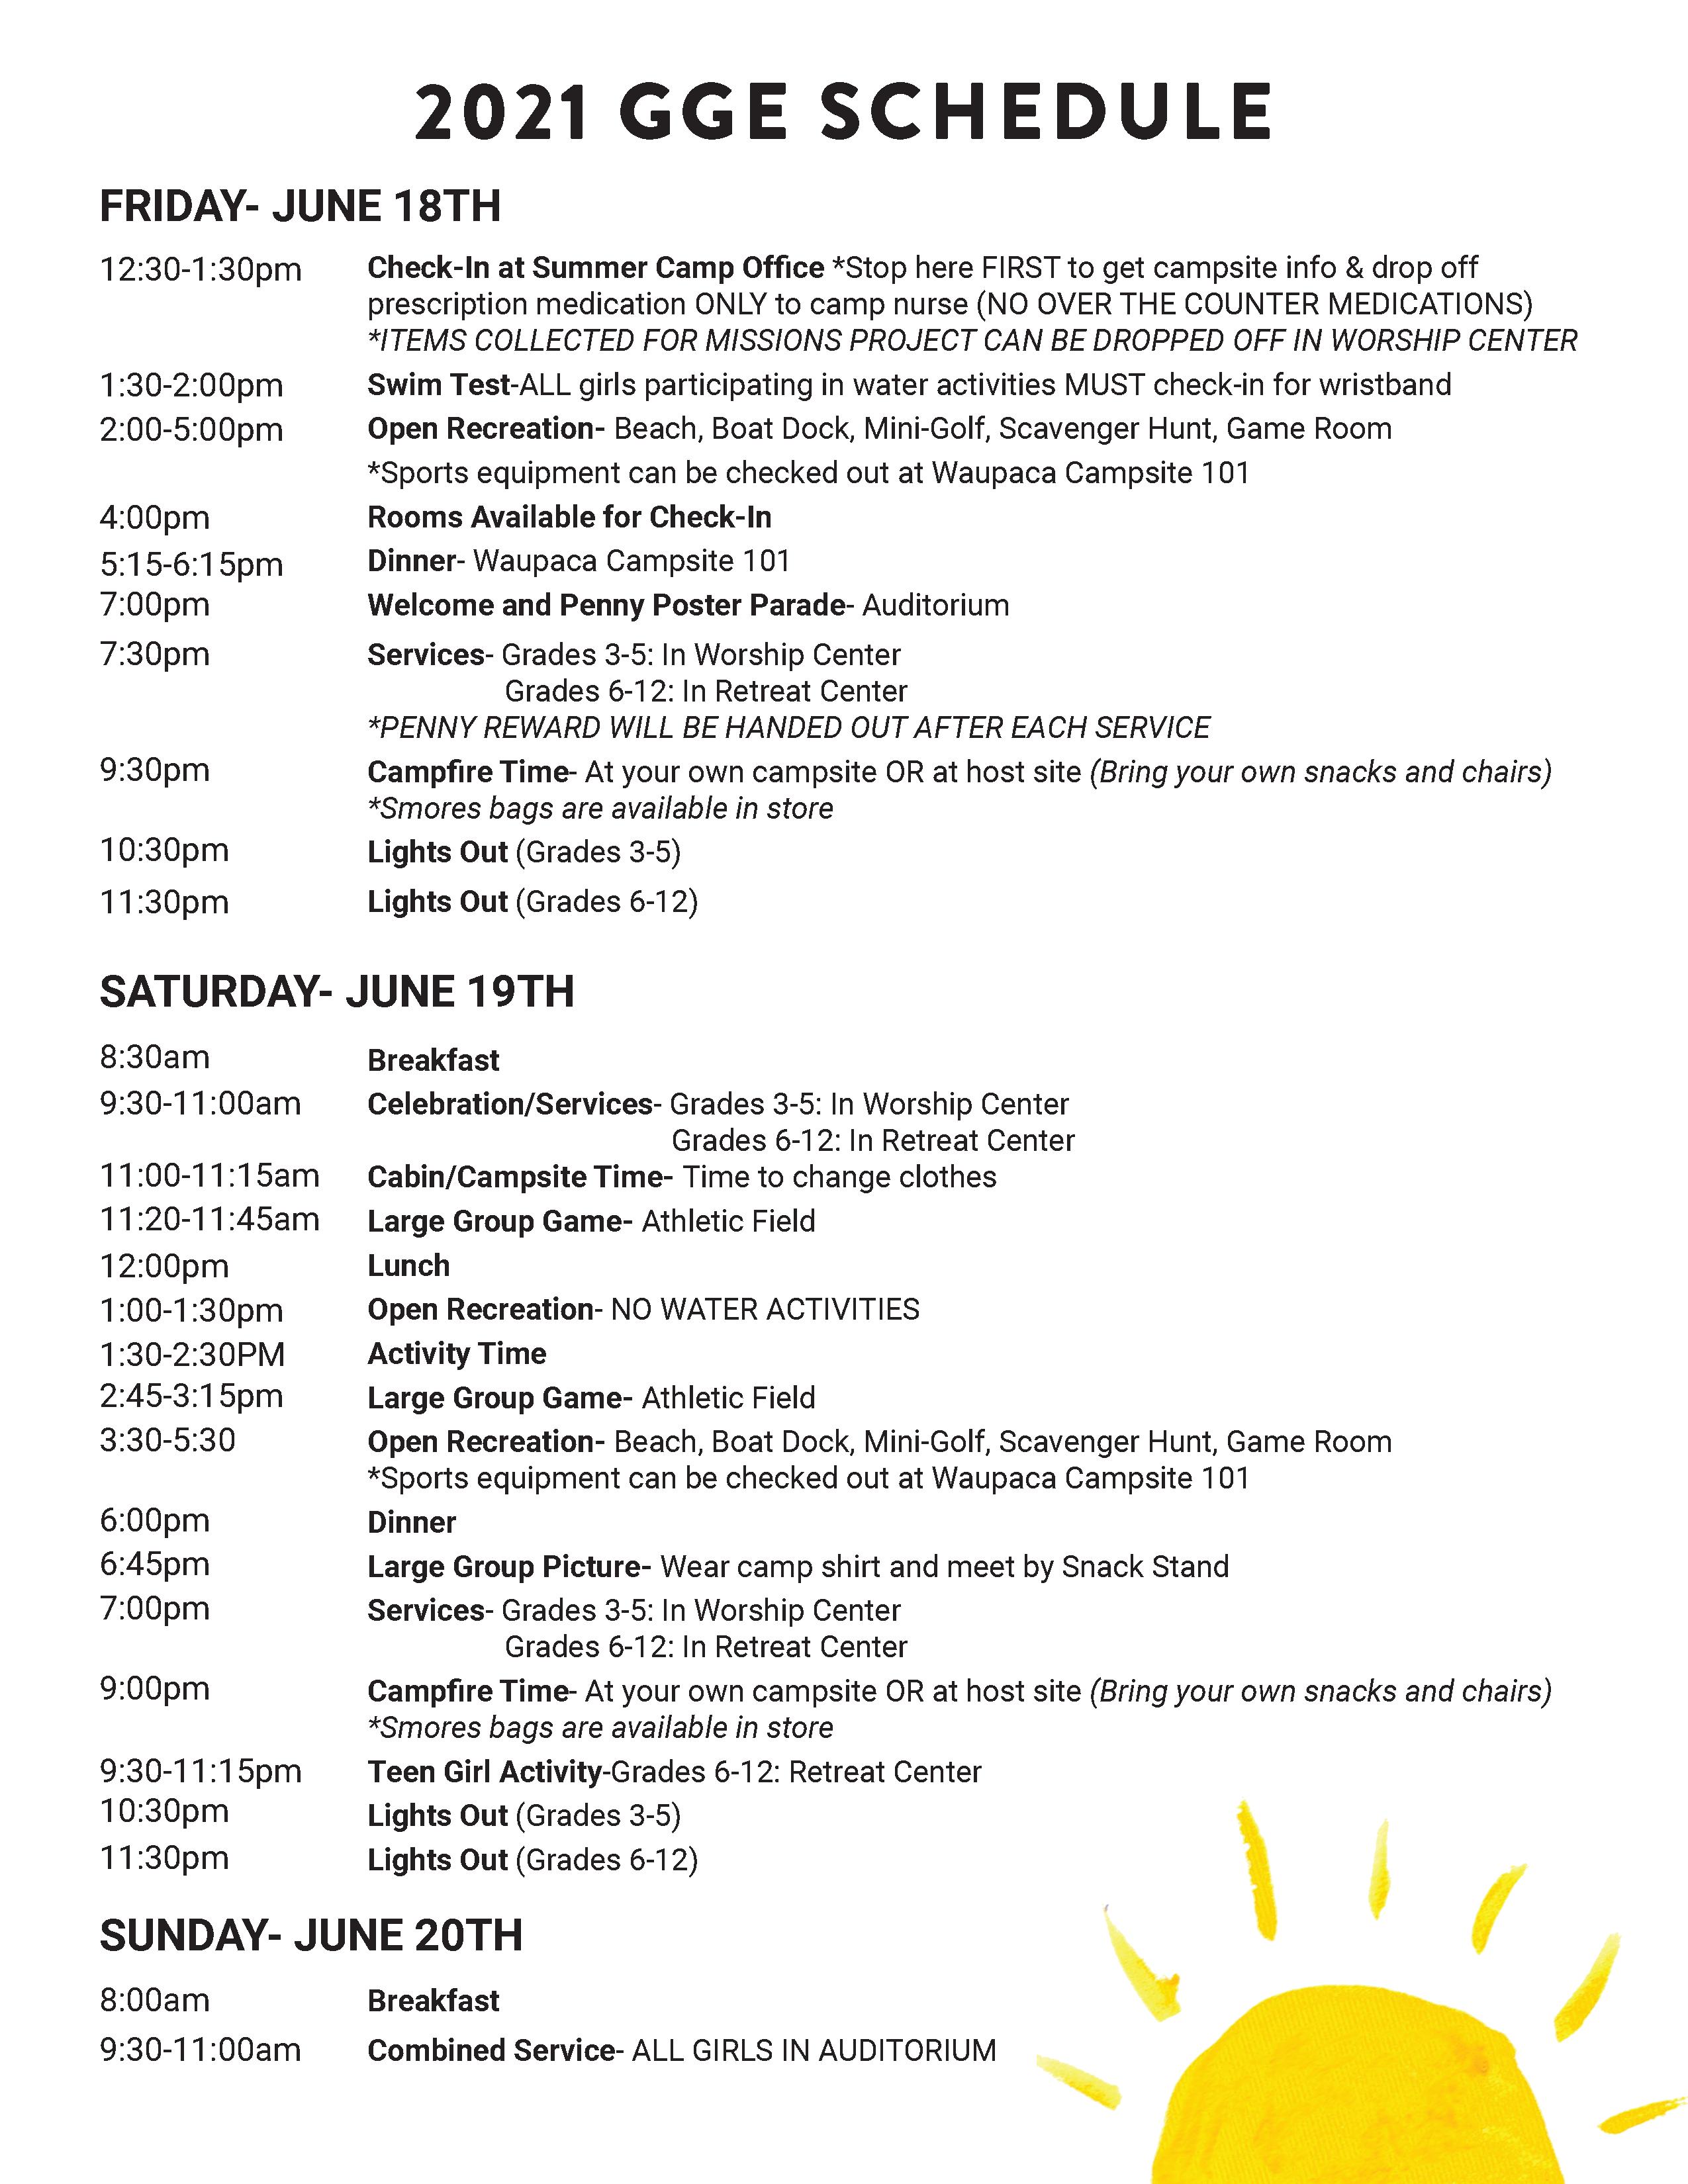 GGE Schedule 2021